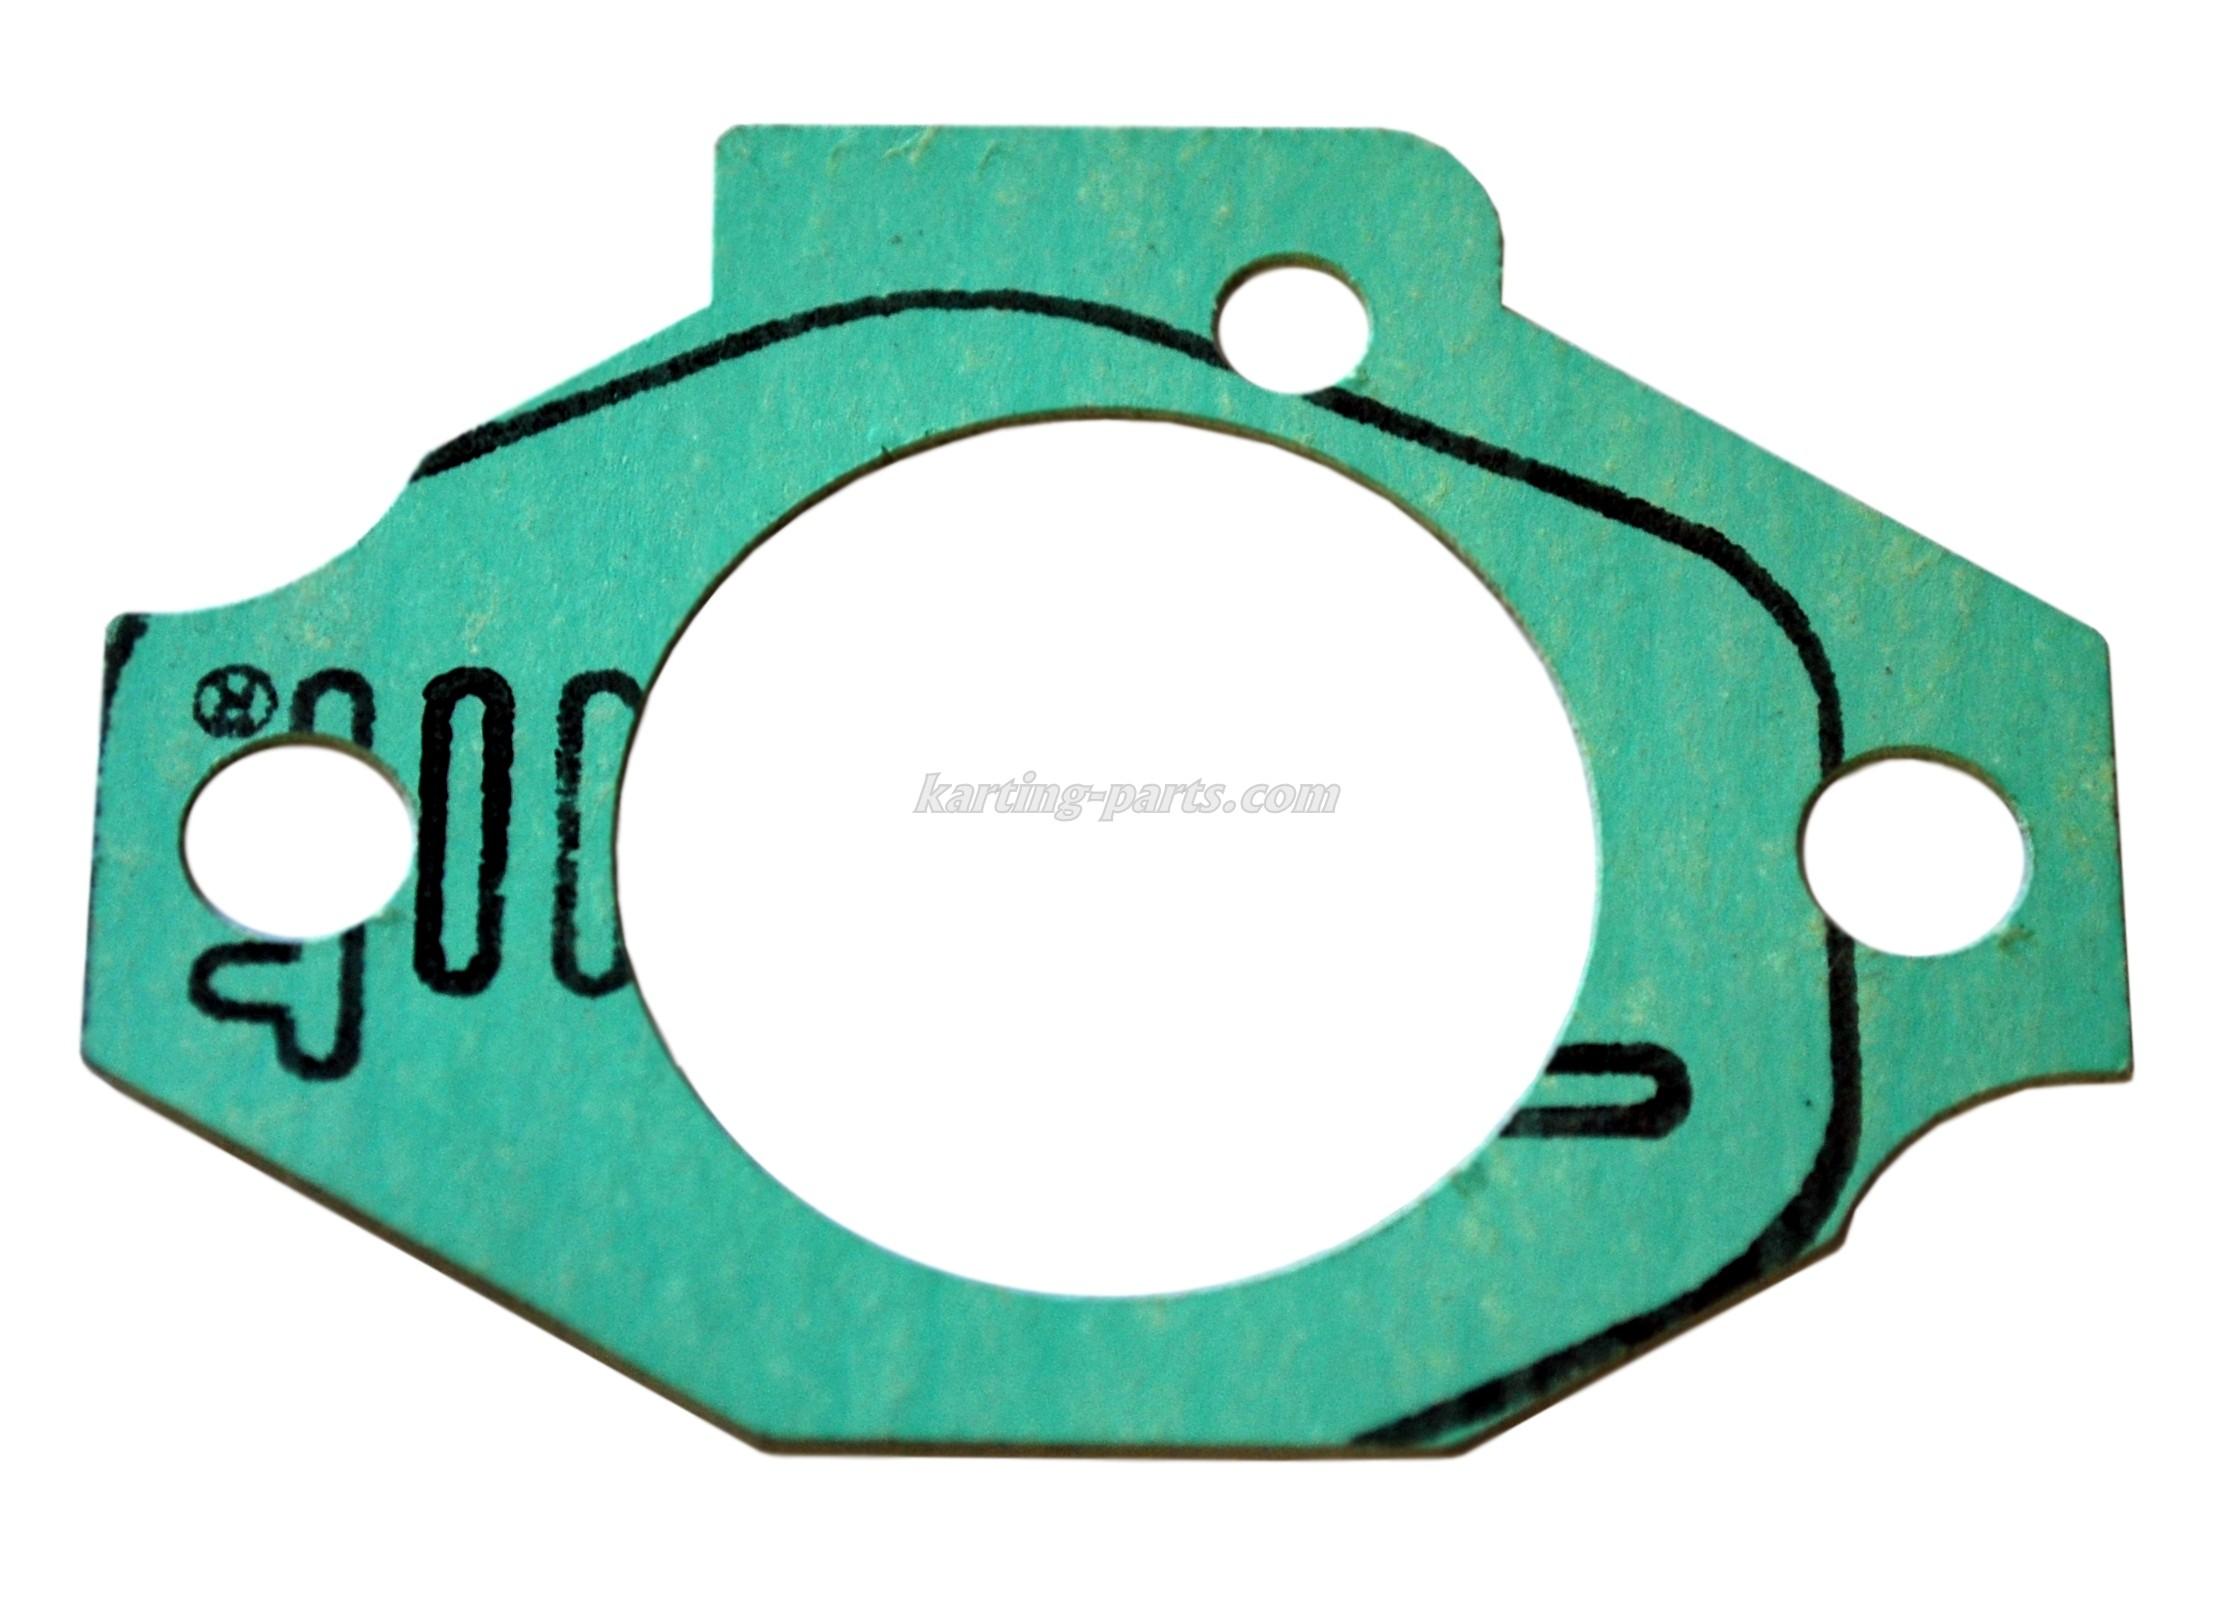 Carburettor gasket Ø28mm